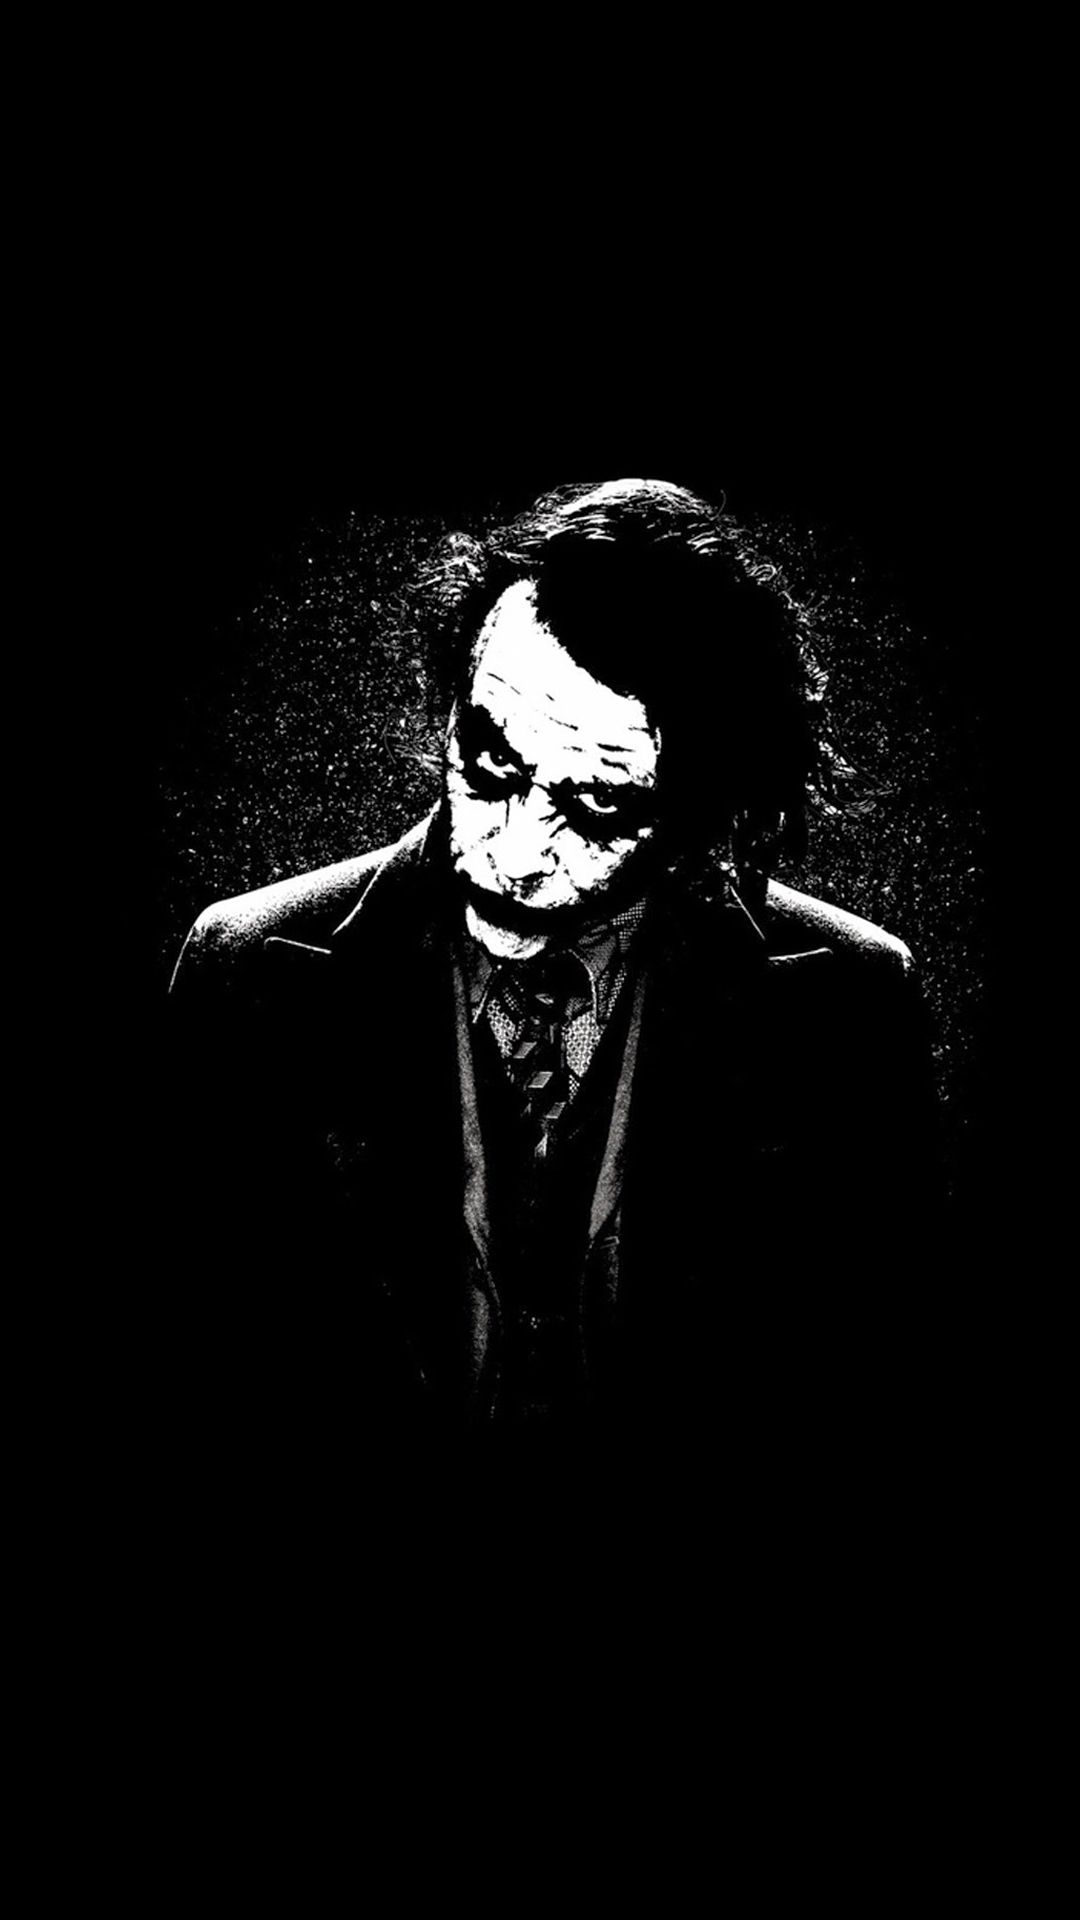 Hình ảnh đen joker